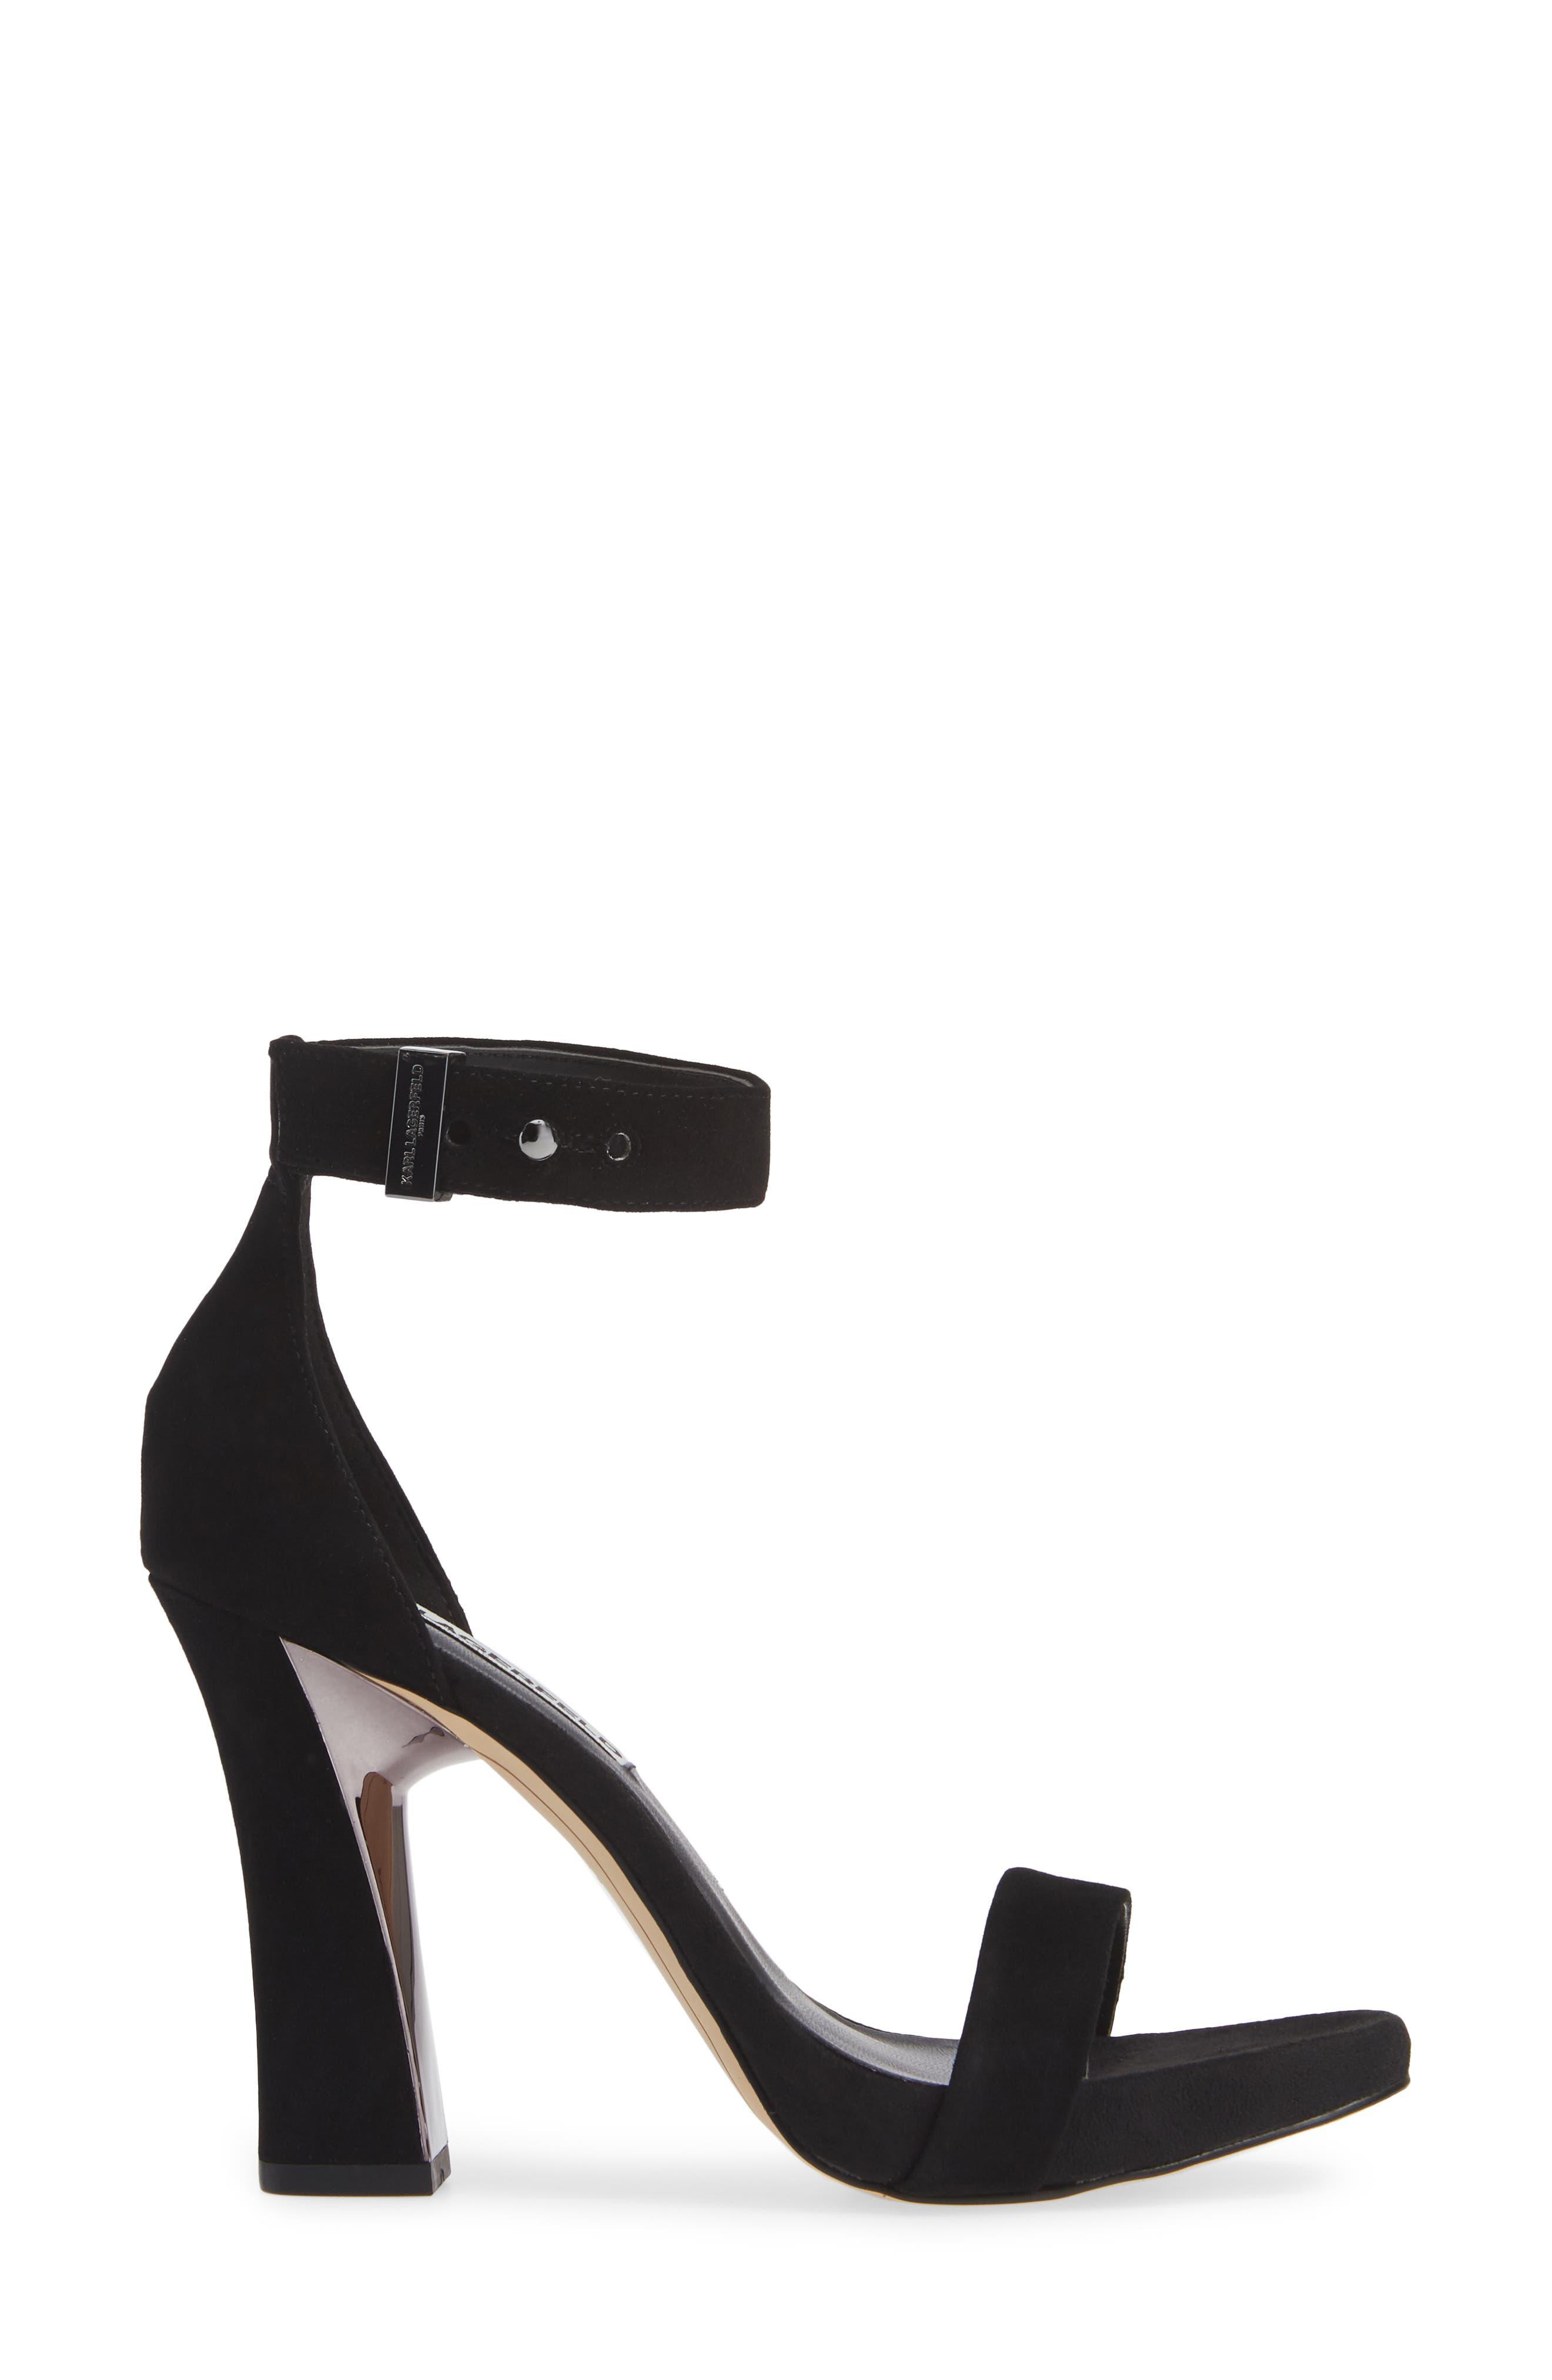 KARL LAGERFELD PARIS, Carah Ankle Strap Sandal, Alternate thumbnail 3, color, BLACK SUEDE